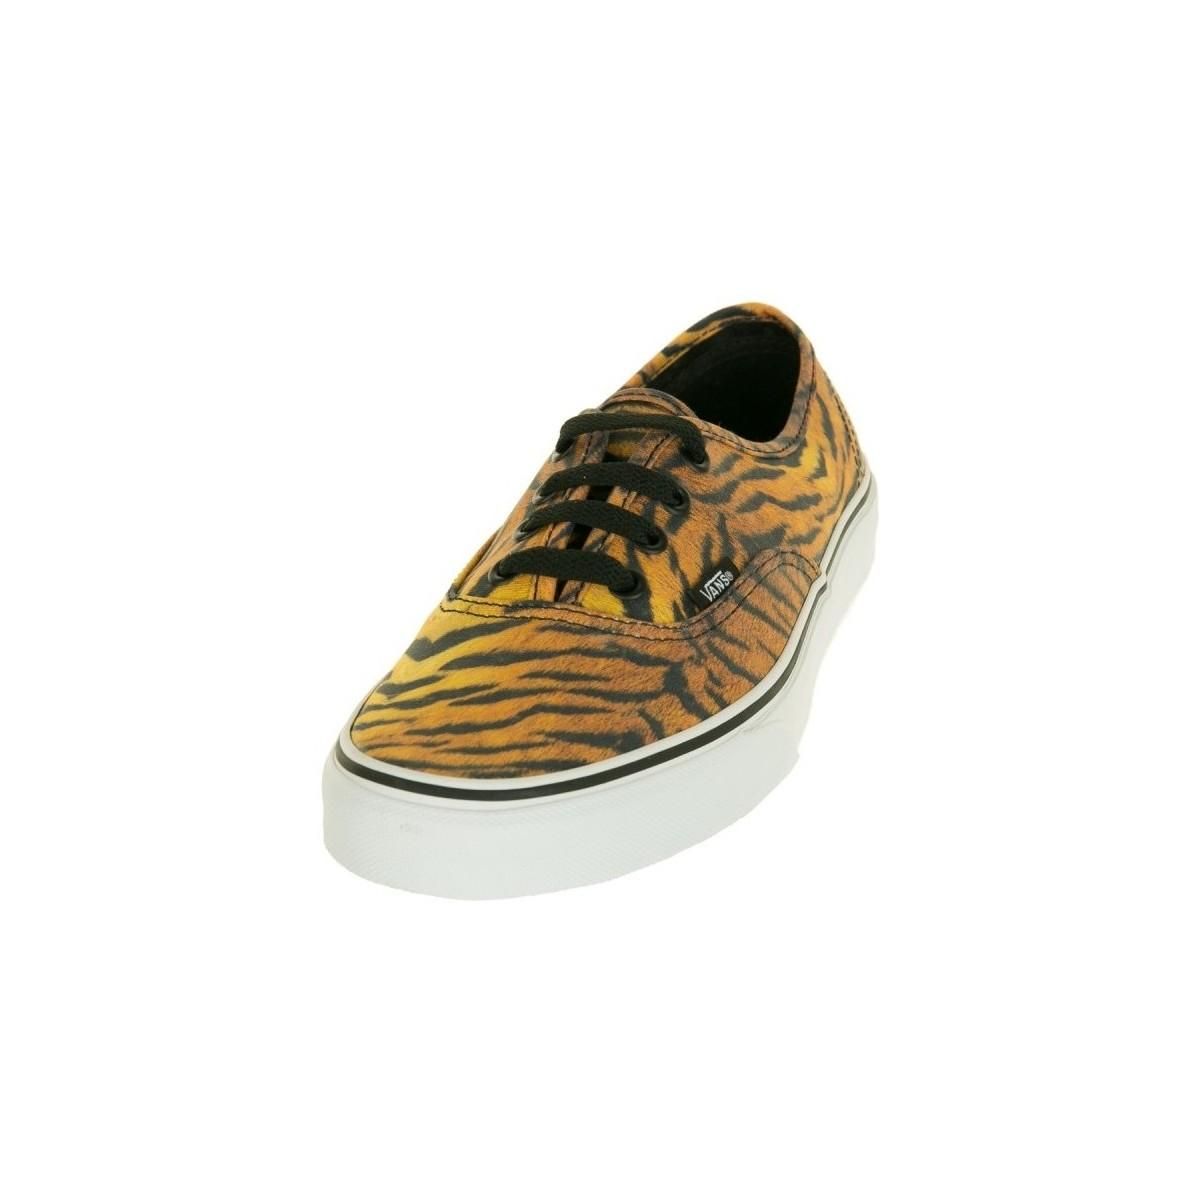 Basket Authentic Tiger - VN-0TSV8VF femmes Chaussures en jaune Vans